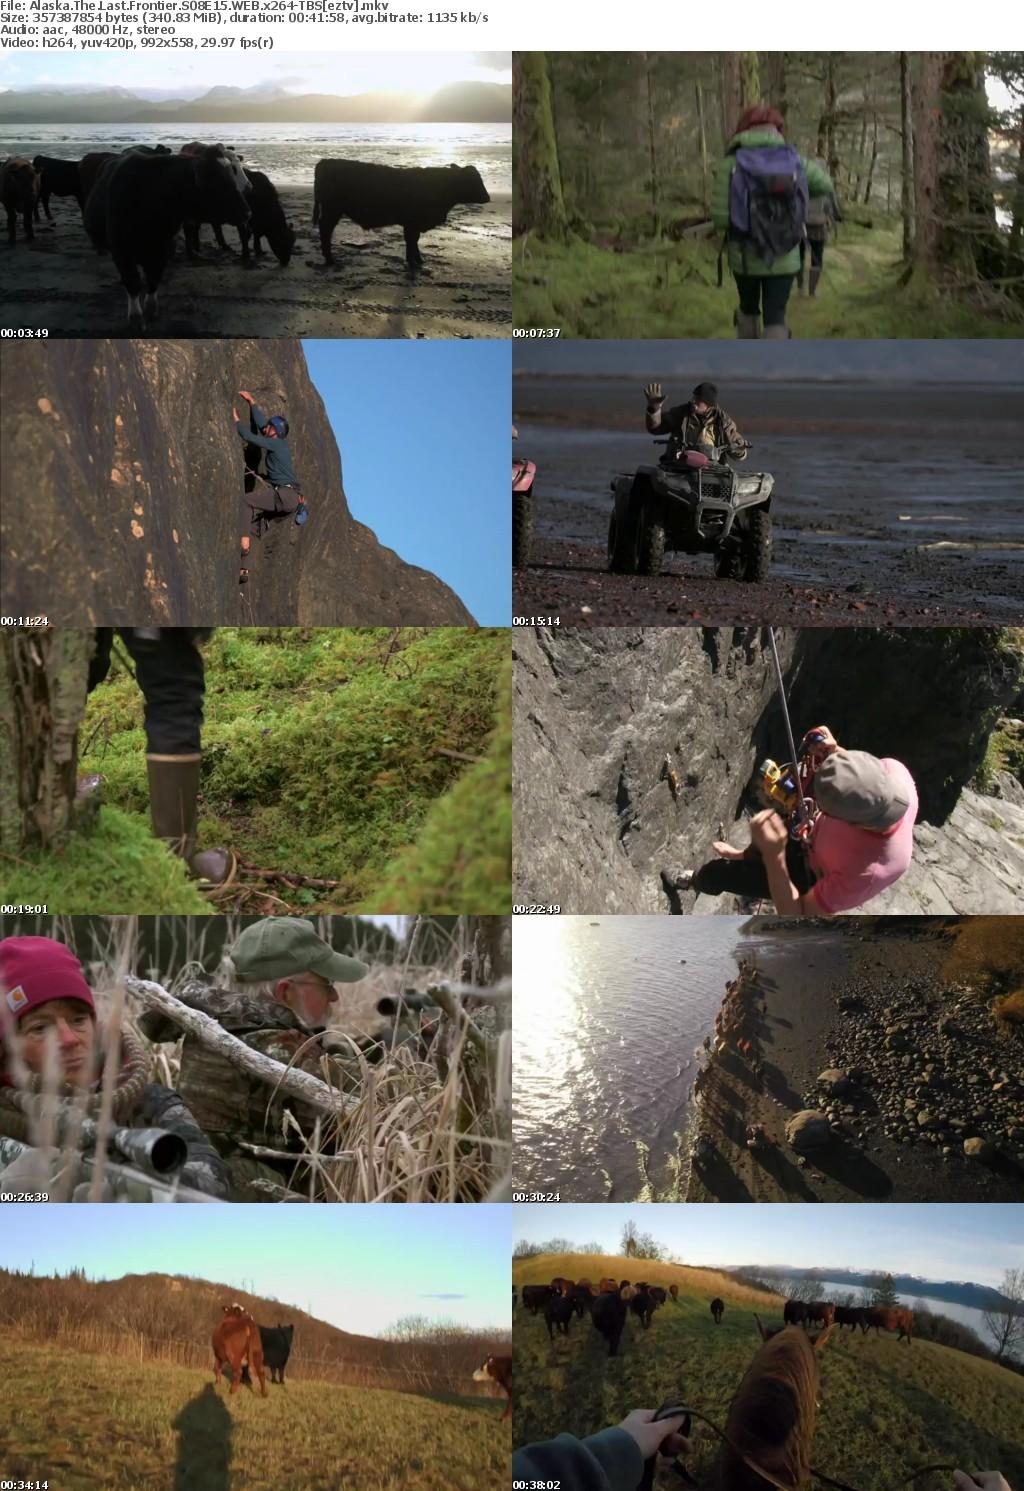 Alaska The Last Frontier S08E15 WEB x264-TBS